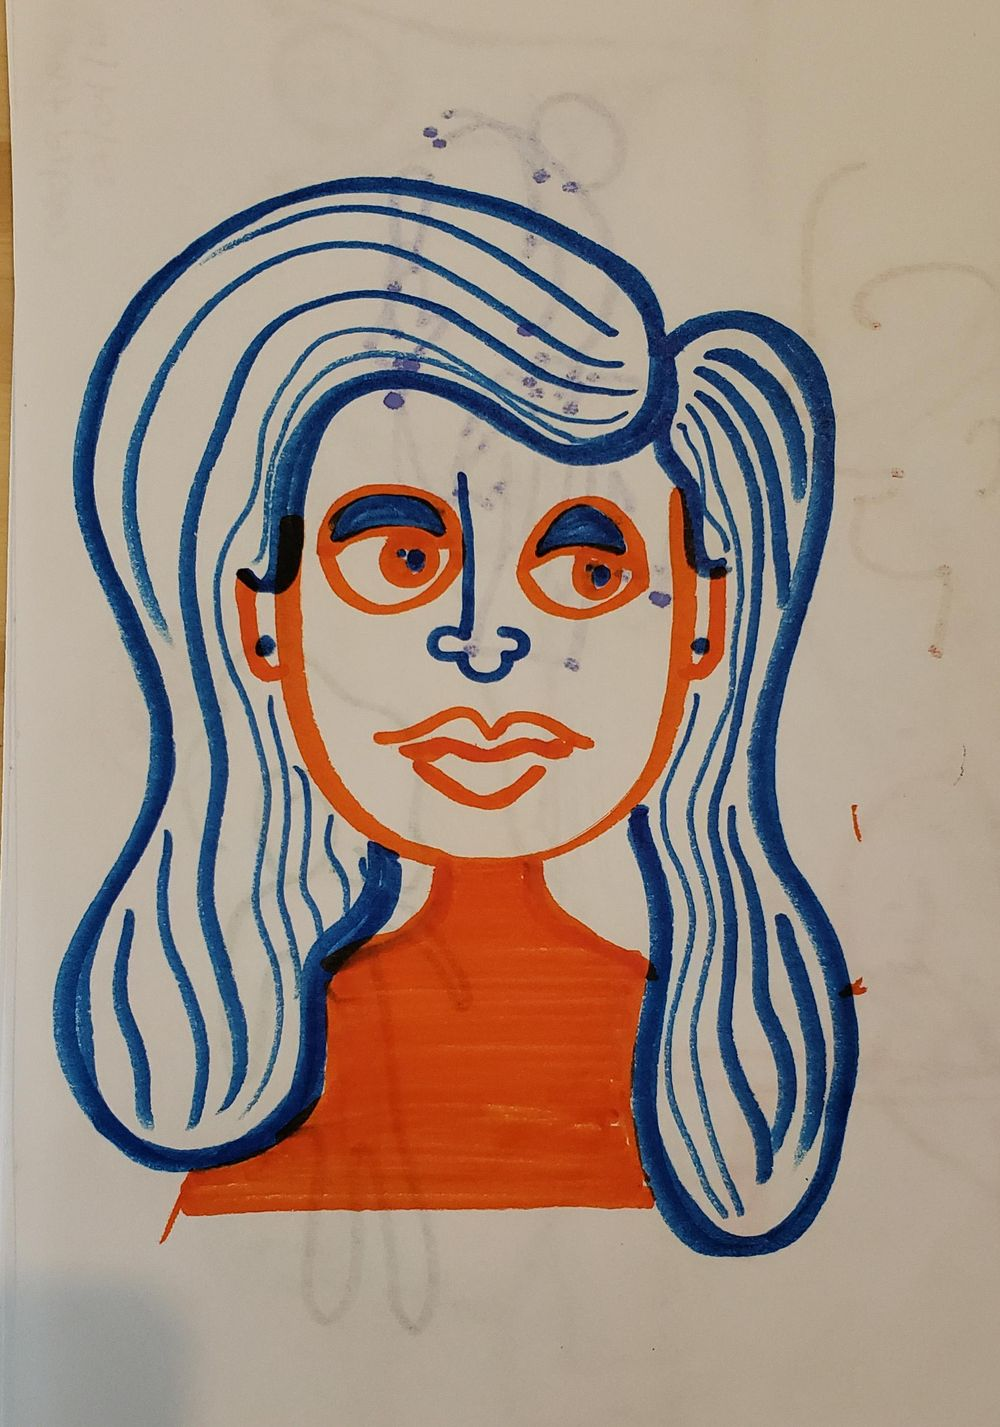 Mariana Ortega - image 4 - student project